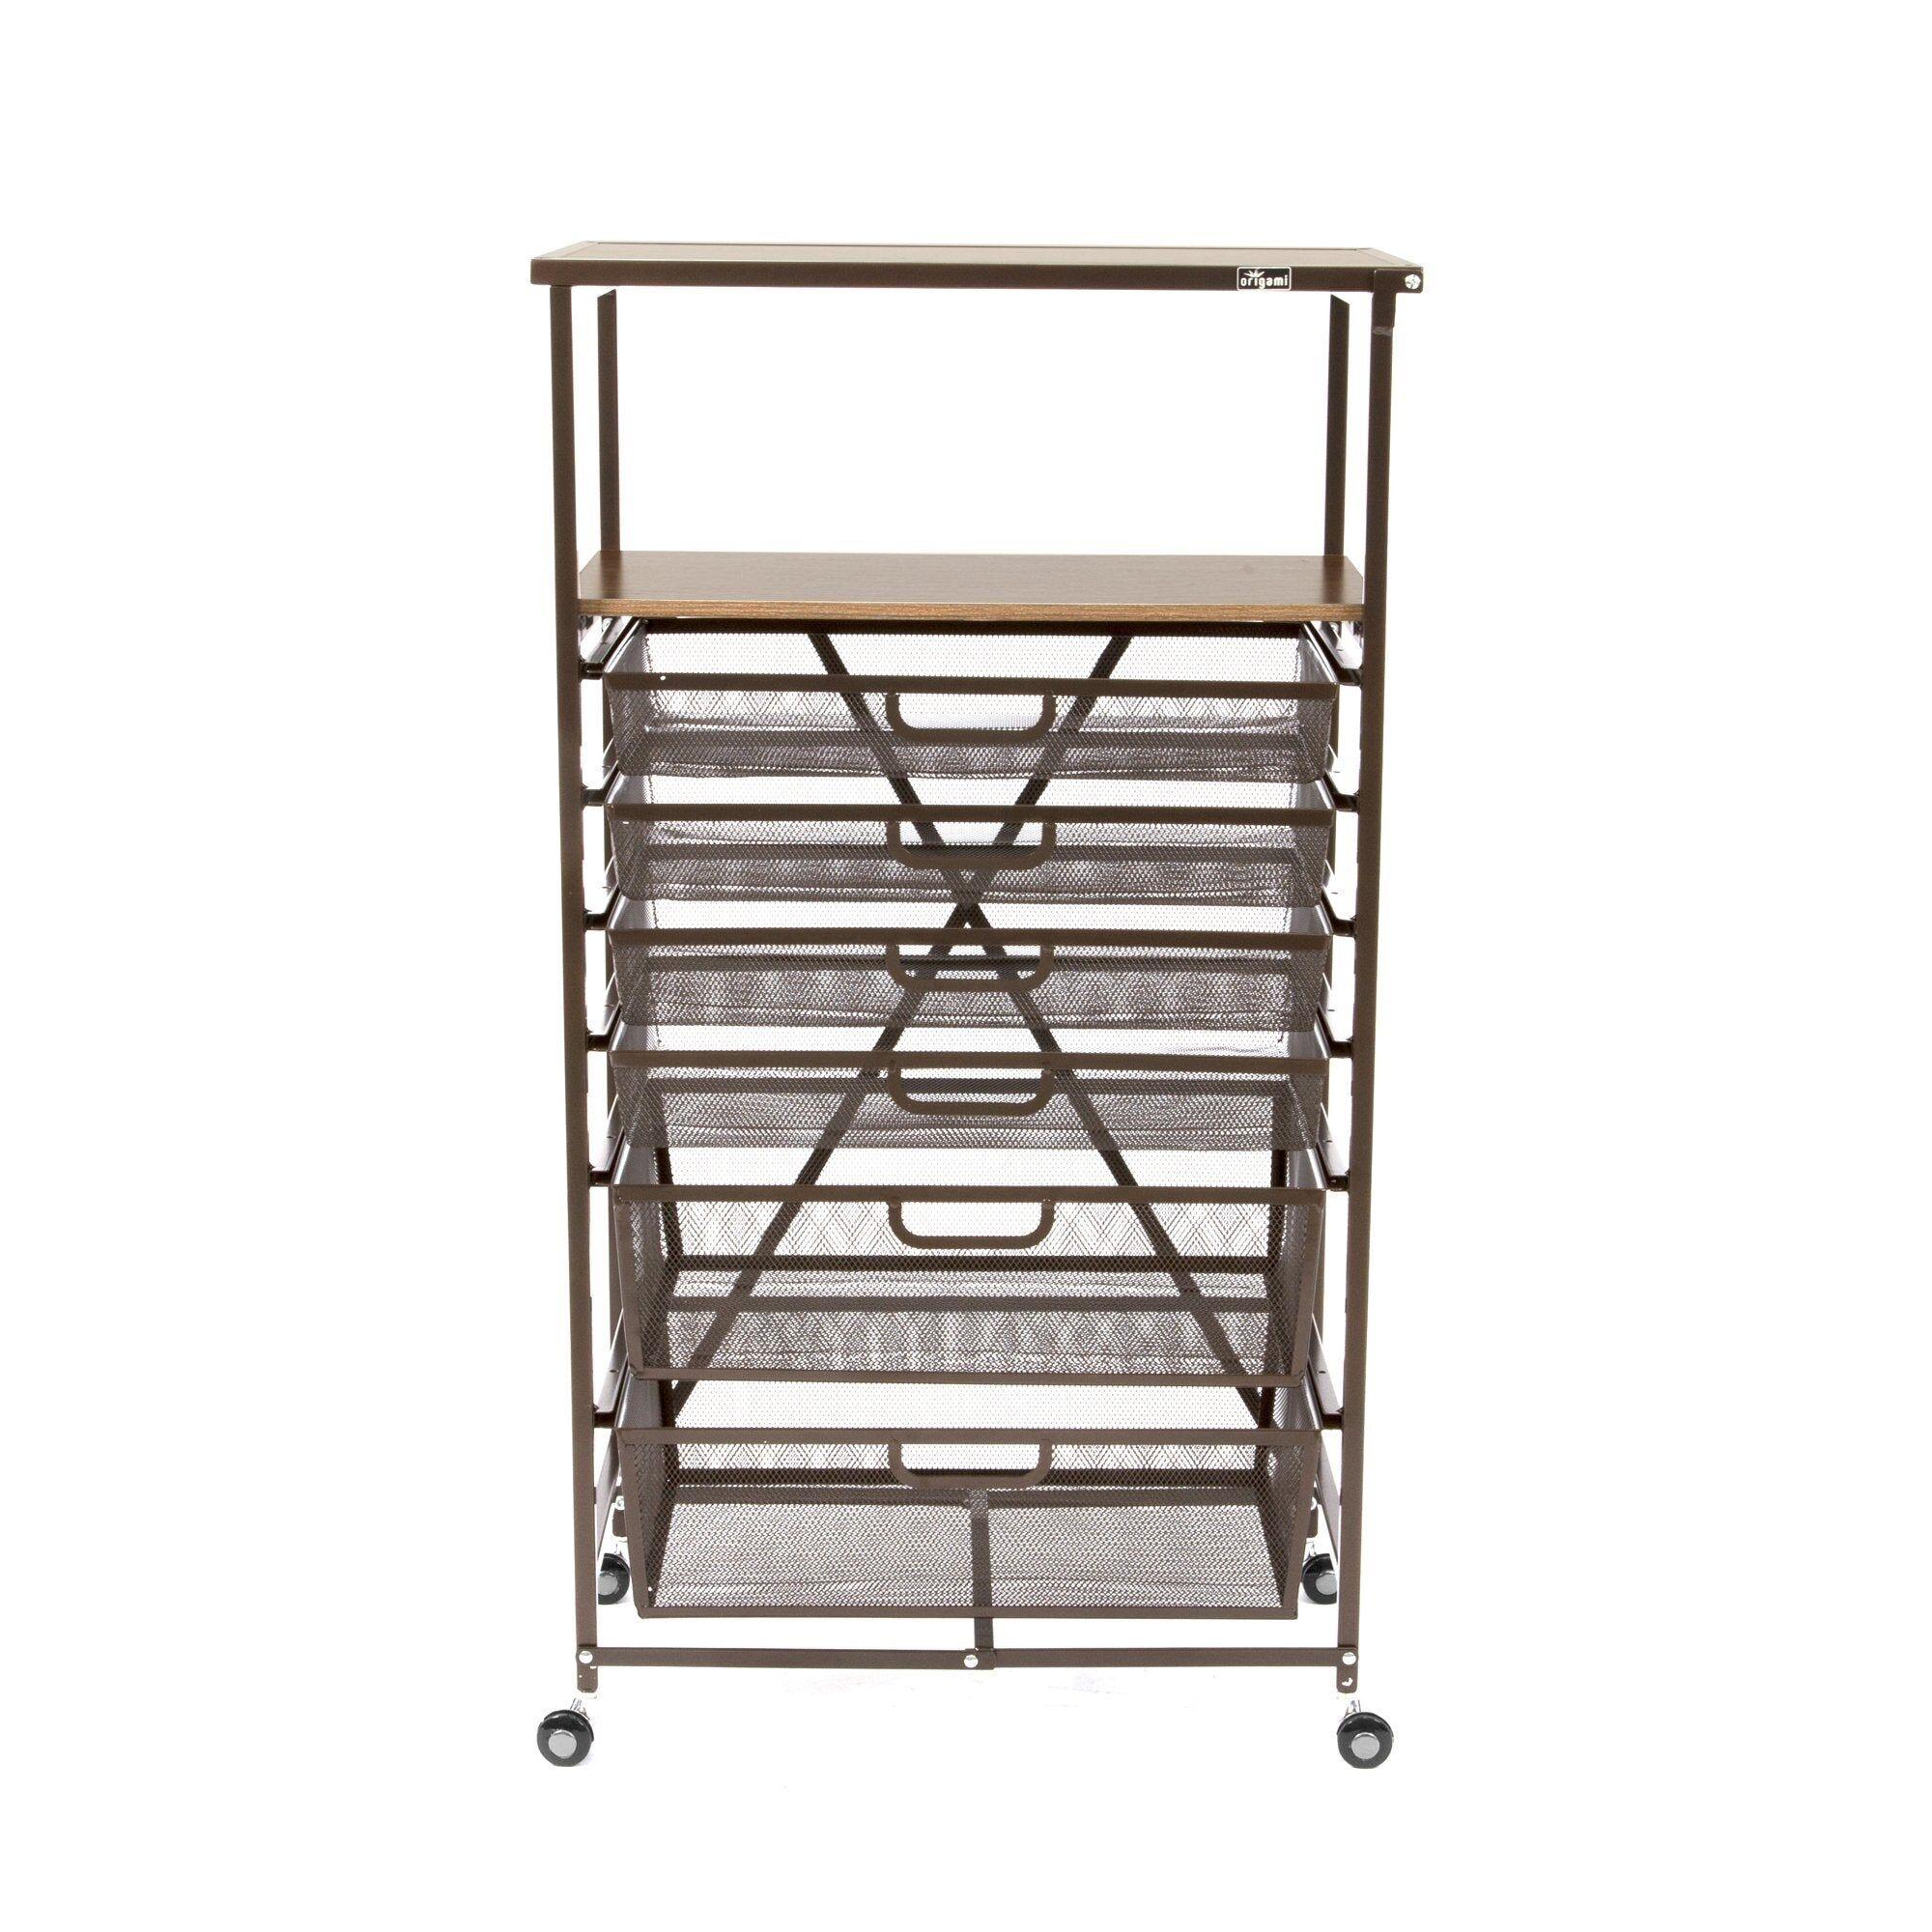 OrigamiRack 6-Drawer Storage Cart